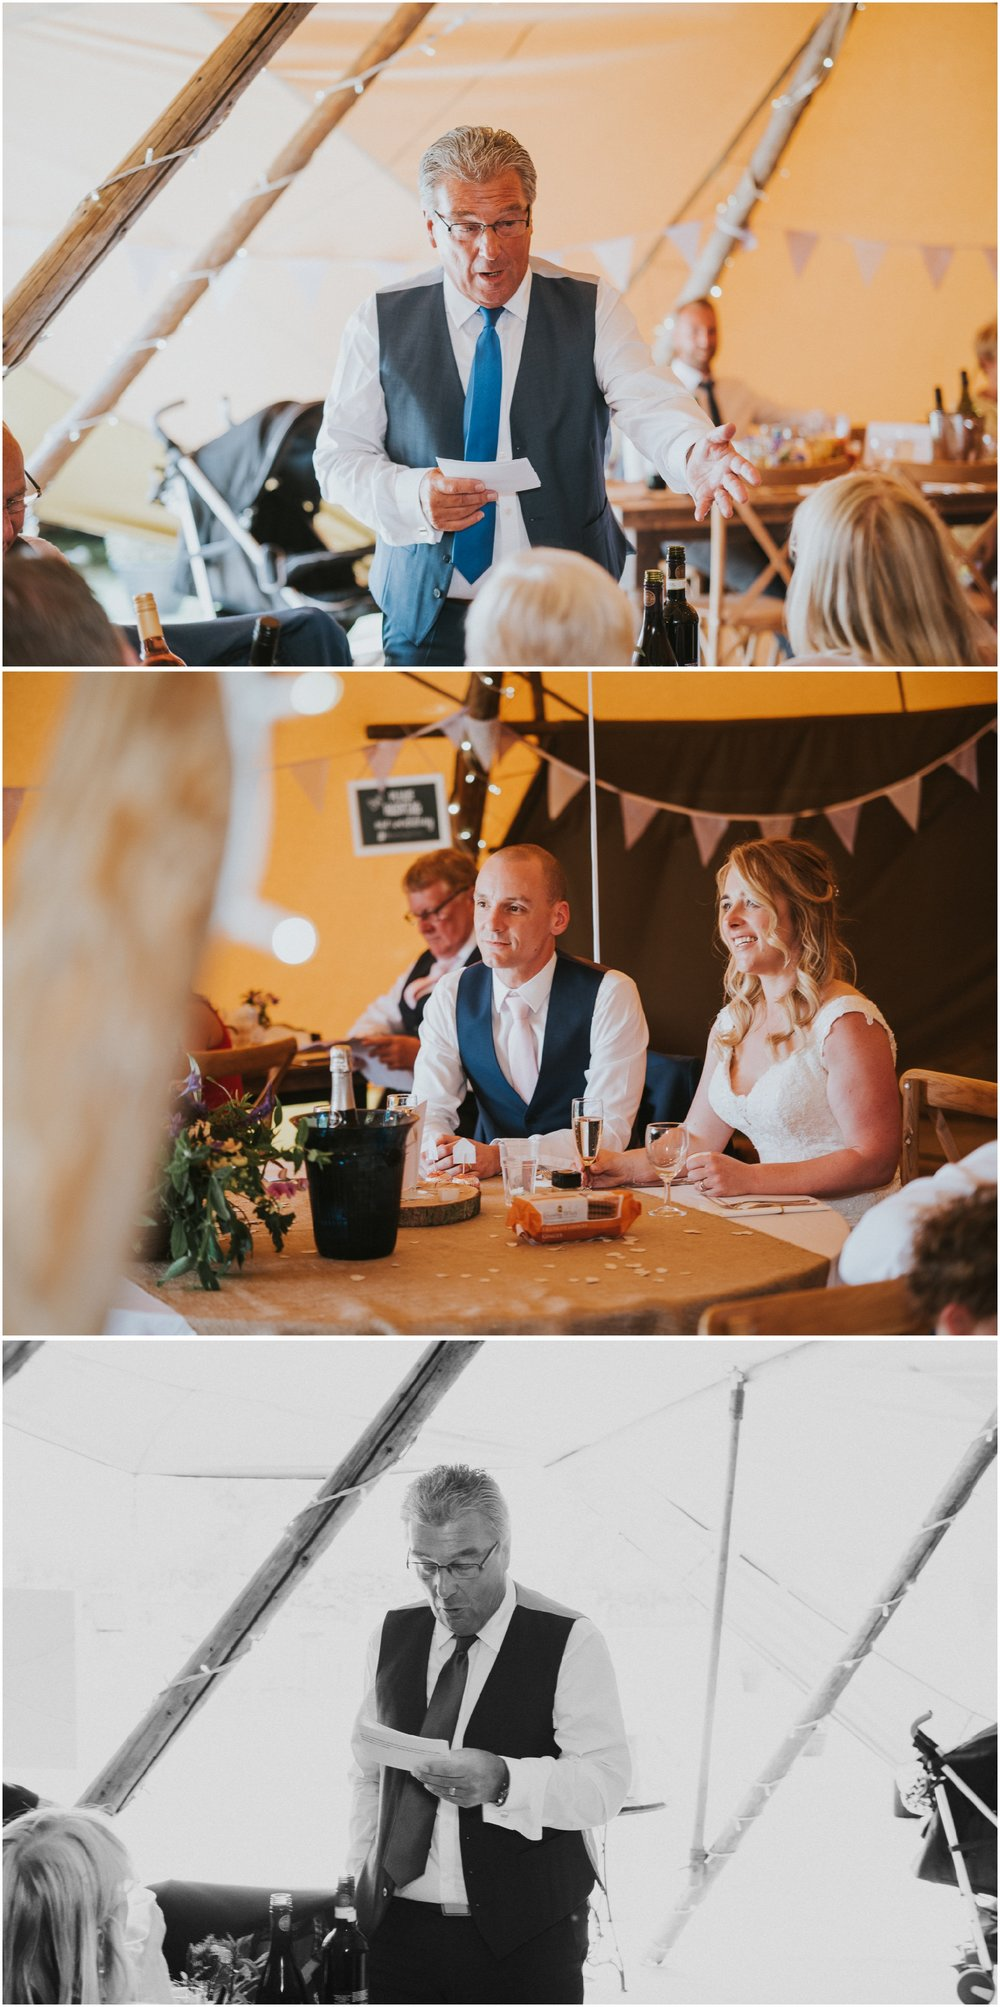 SkipbridegFarmWedding-LukeHolroyd-Yorkshirewedding_0093.jpg